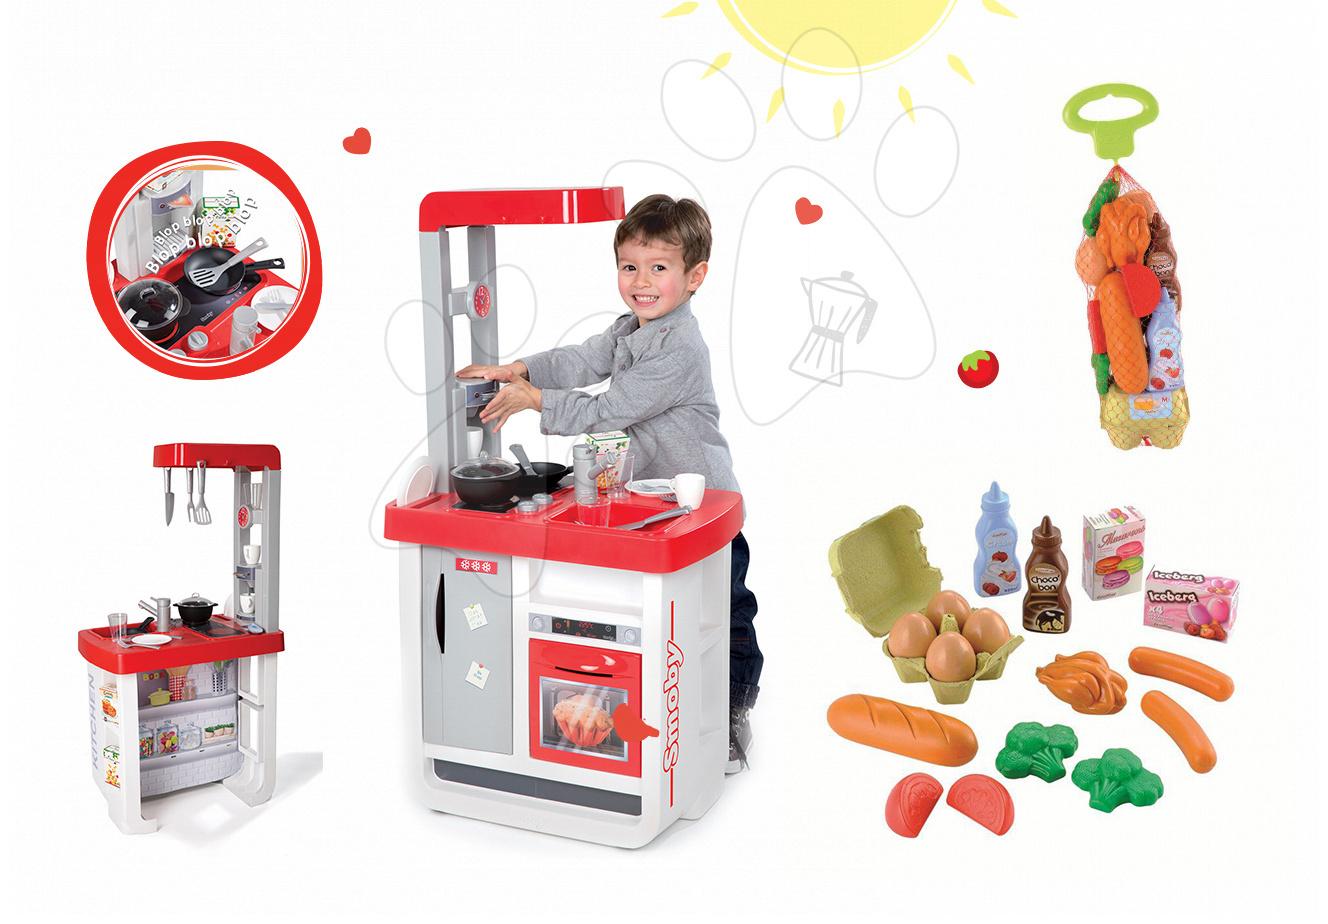 Kuchynky pre deti sety - Set kuchynka Bon Appétit Smoby so zvukmi a kávovarom a potraviny v sieťke Bubble Cook